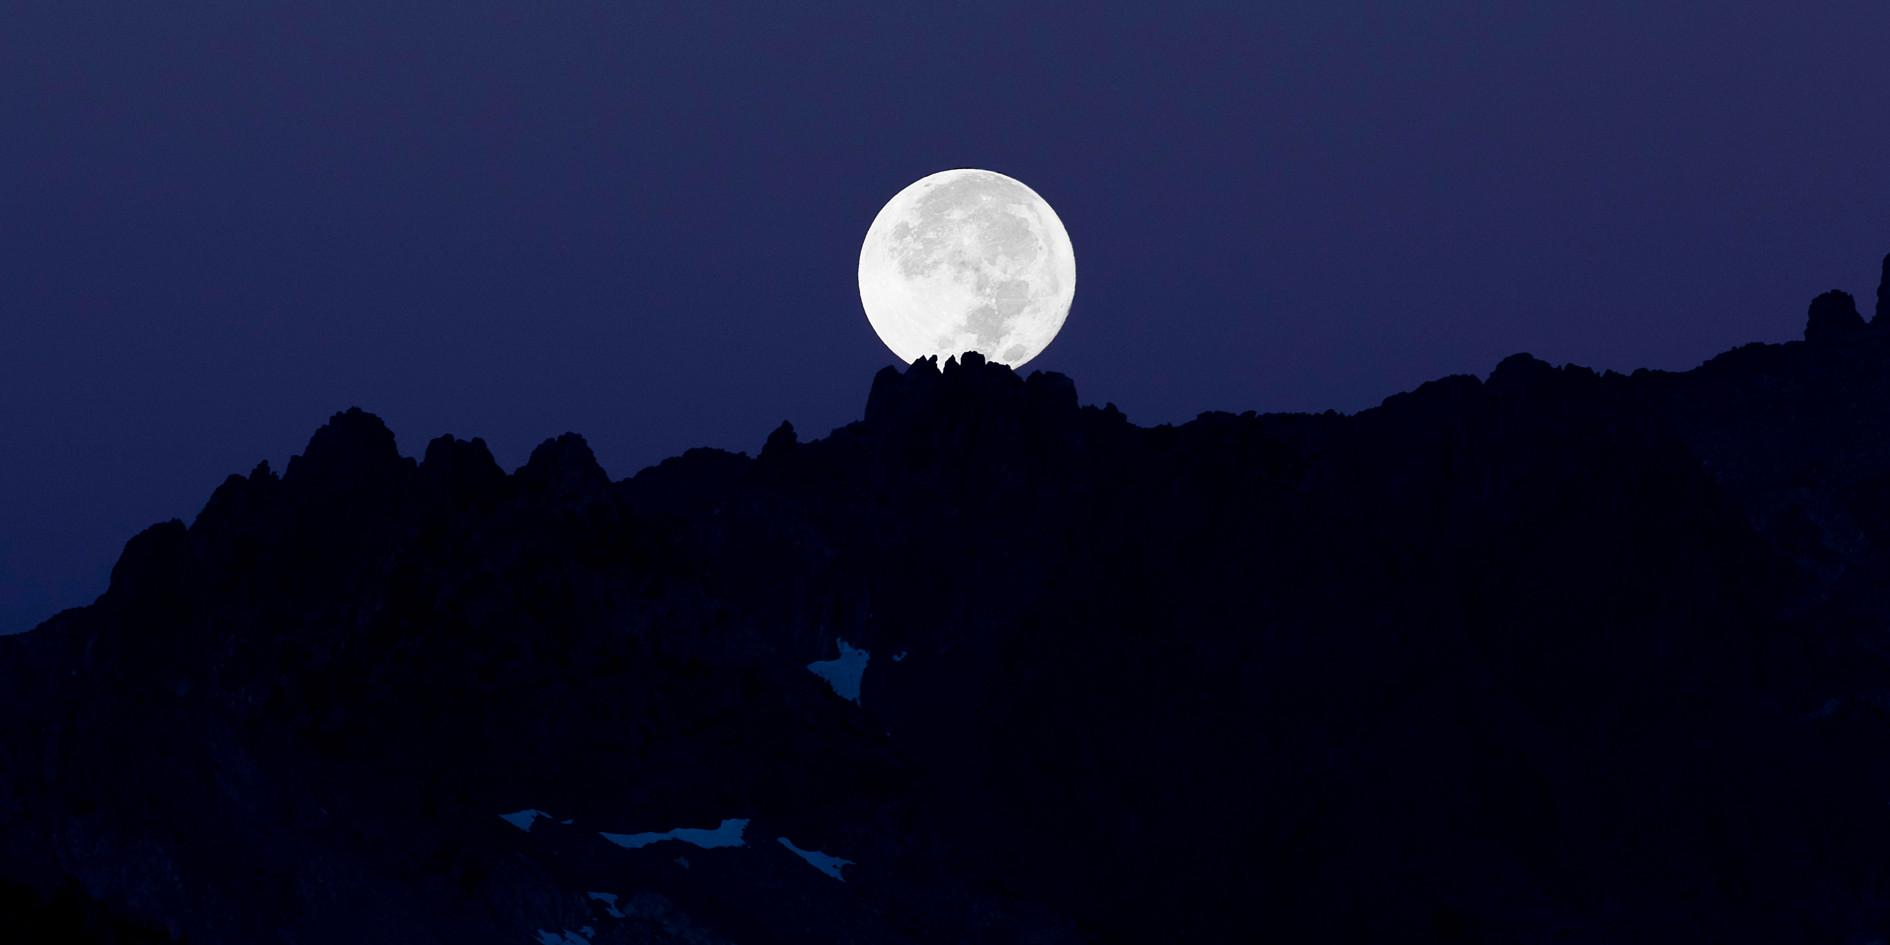 Bob Kent - Harvest Moon Over the Minaret